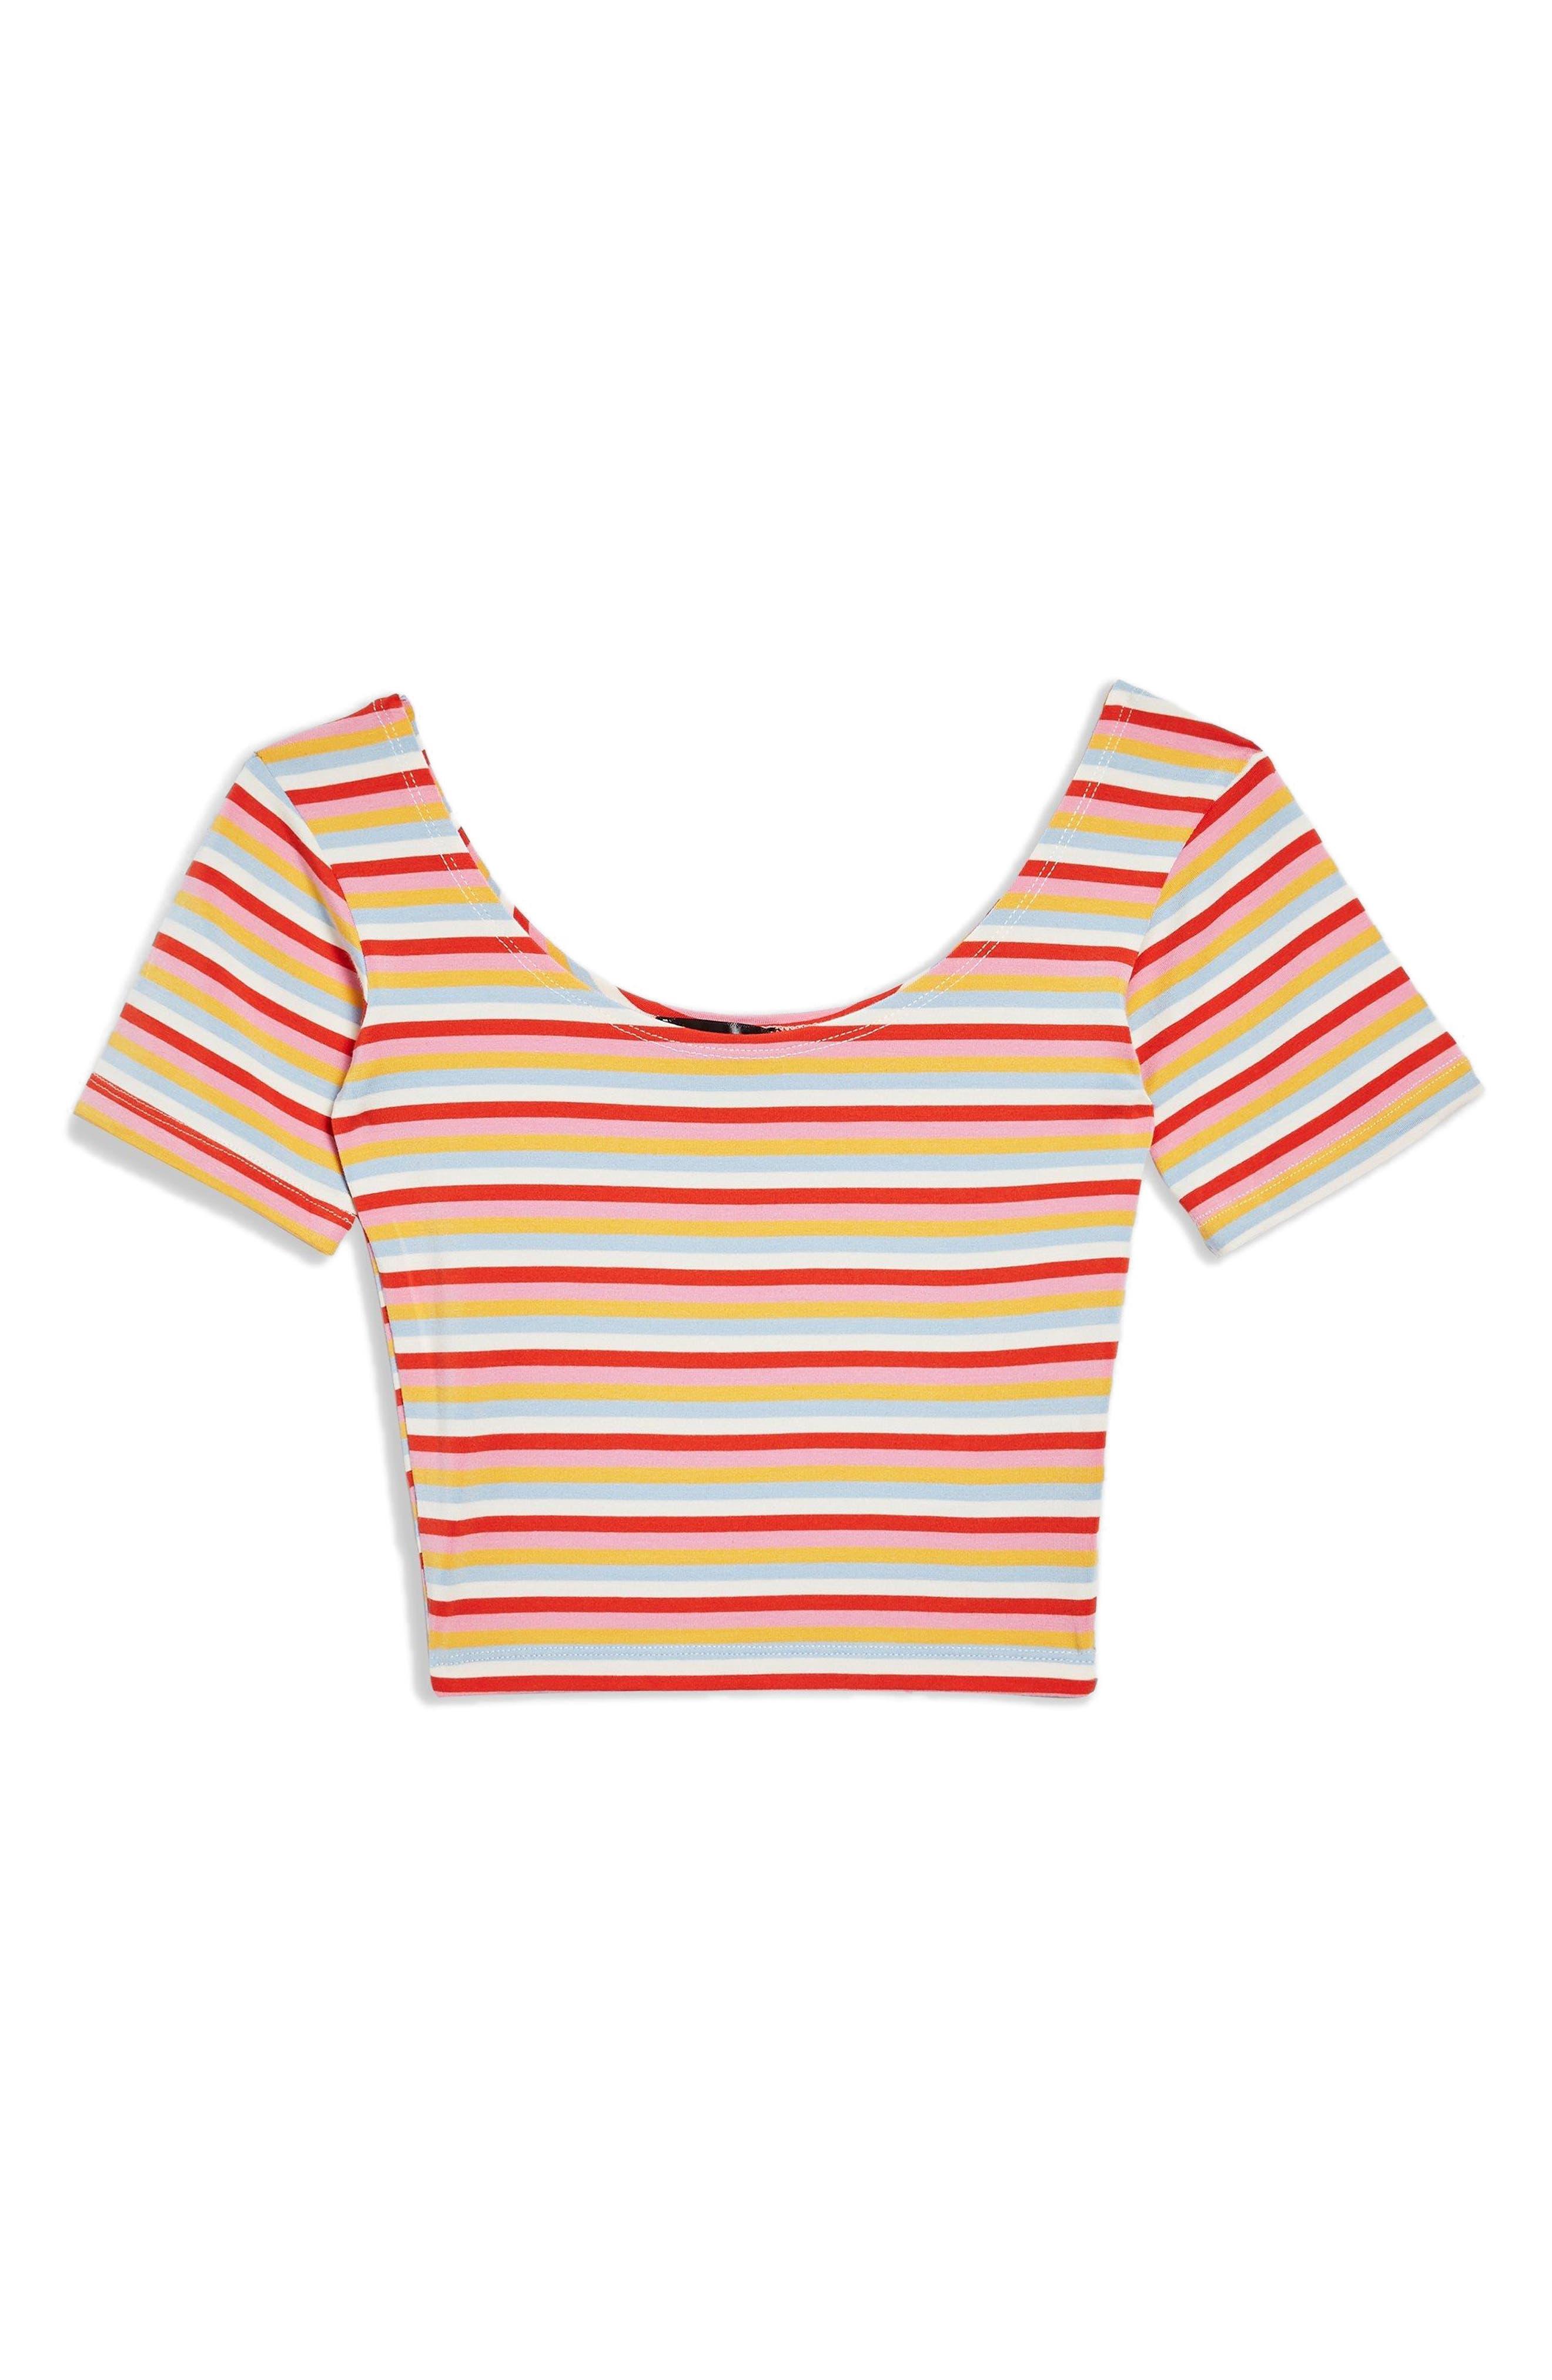 Stripe Crop Top,                             Alternate thumbnail 4, color,                             601